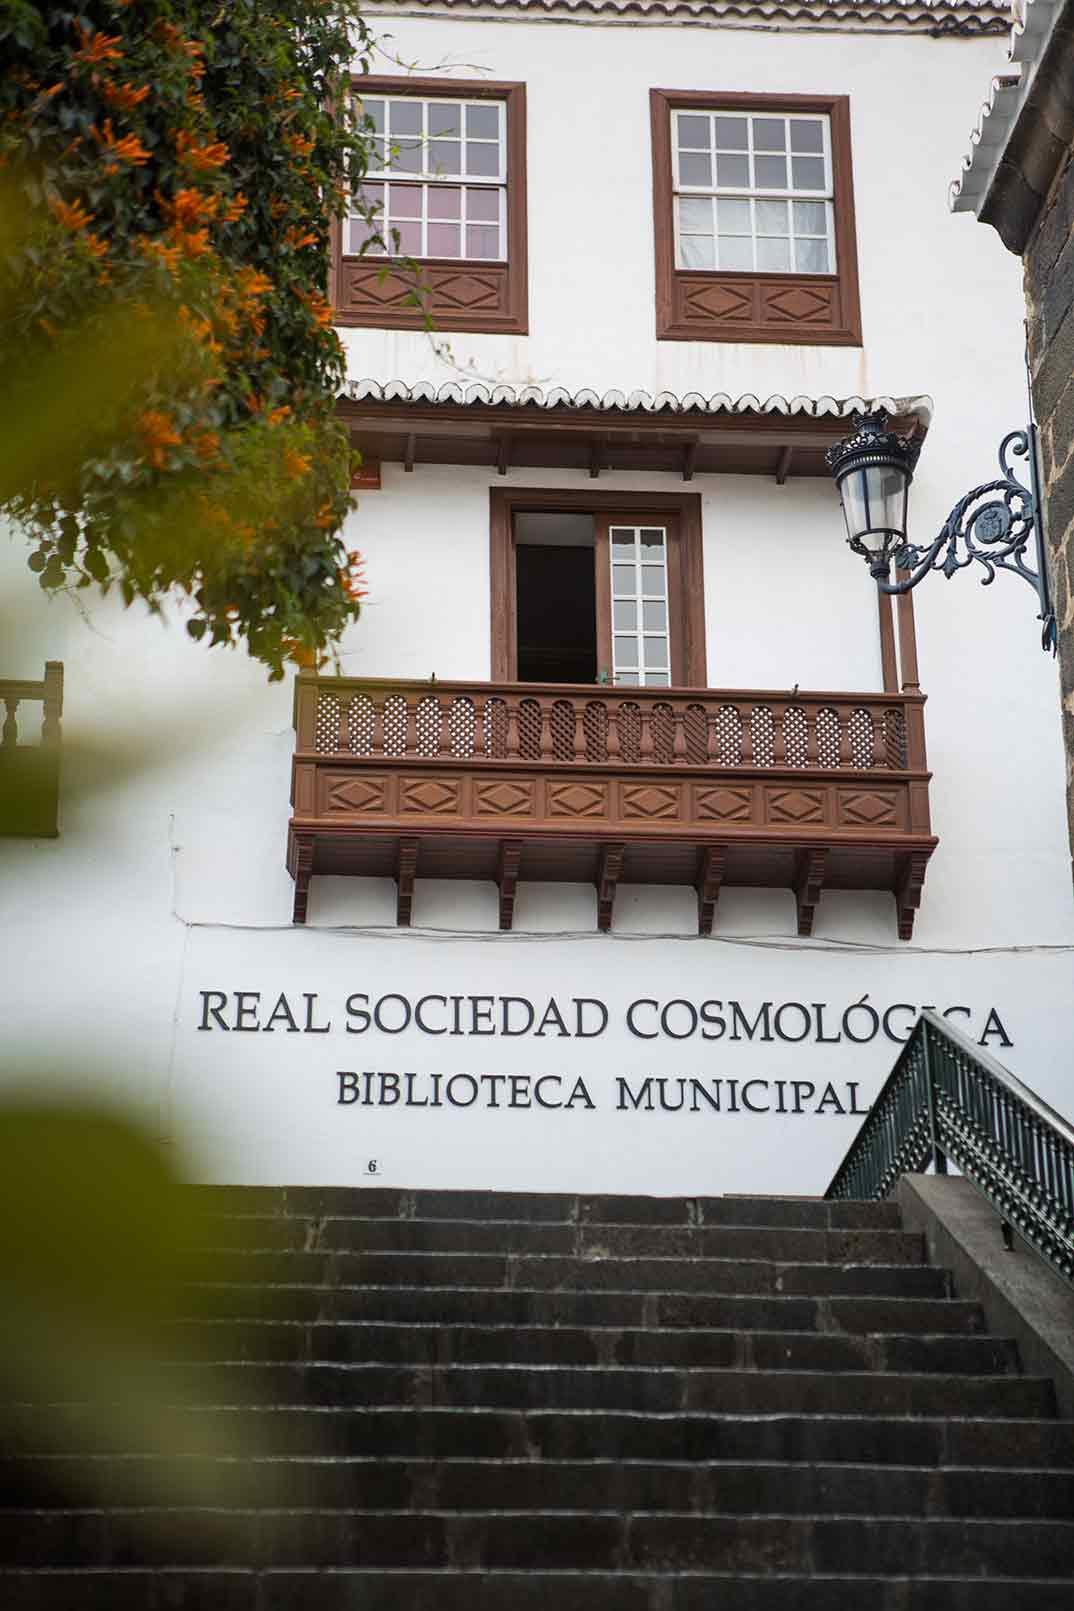 La Palma - La Cosmológica